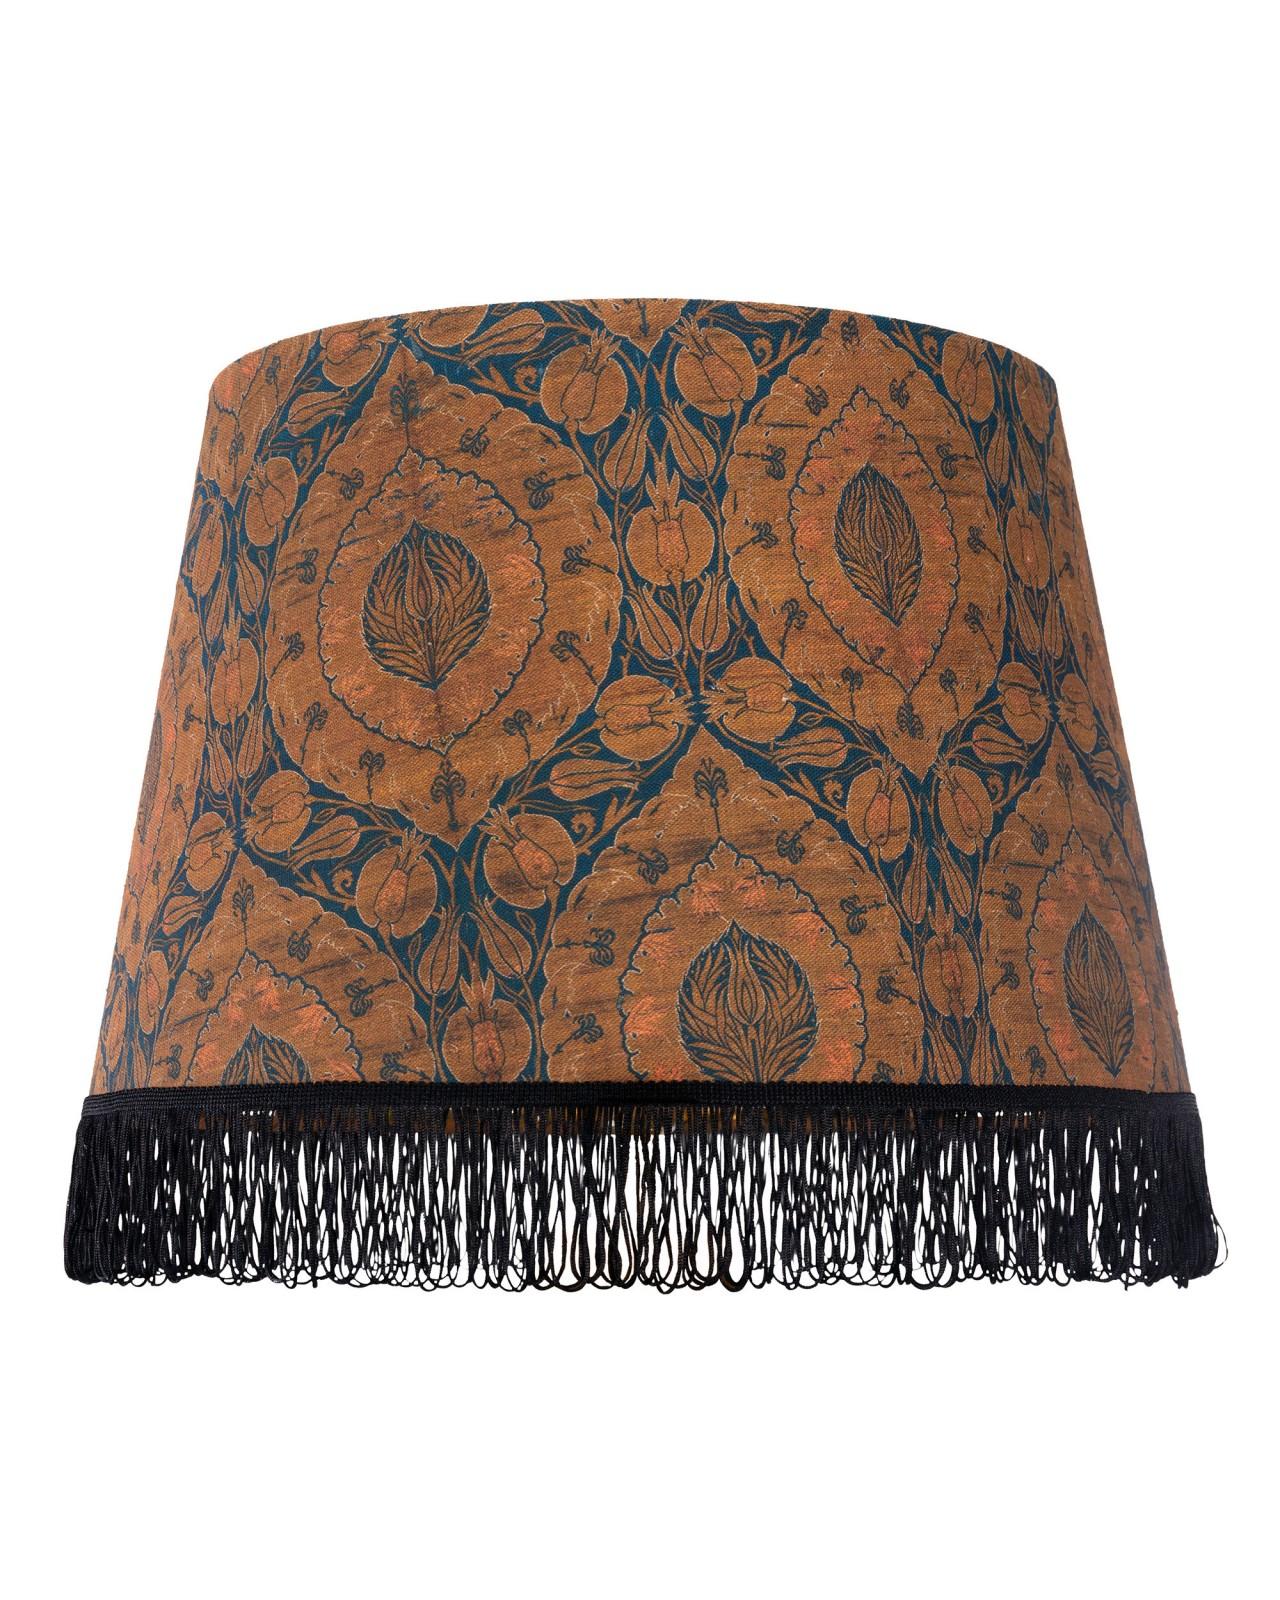 KAFTAN KALASH Table Lamp